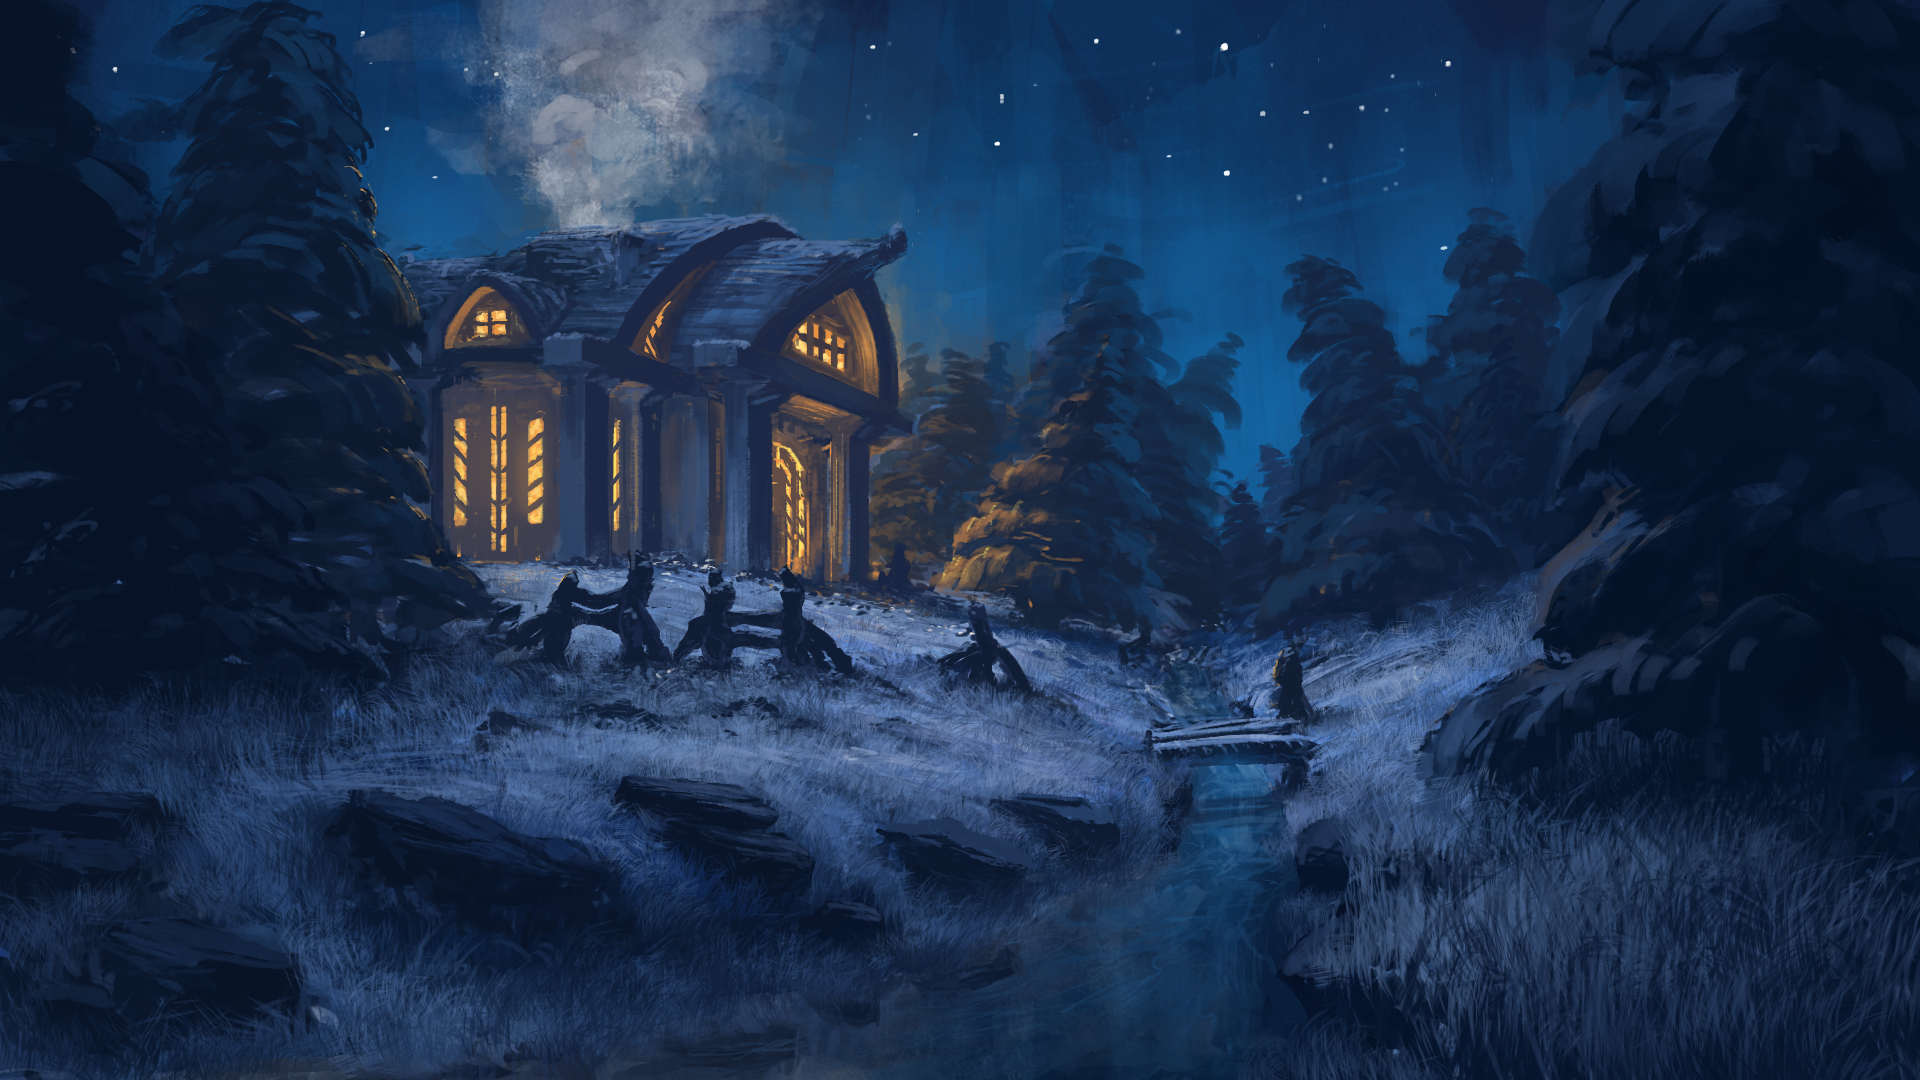 Winter Night By Tomprante On Deviantart Forest Art Night Art Night Painting